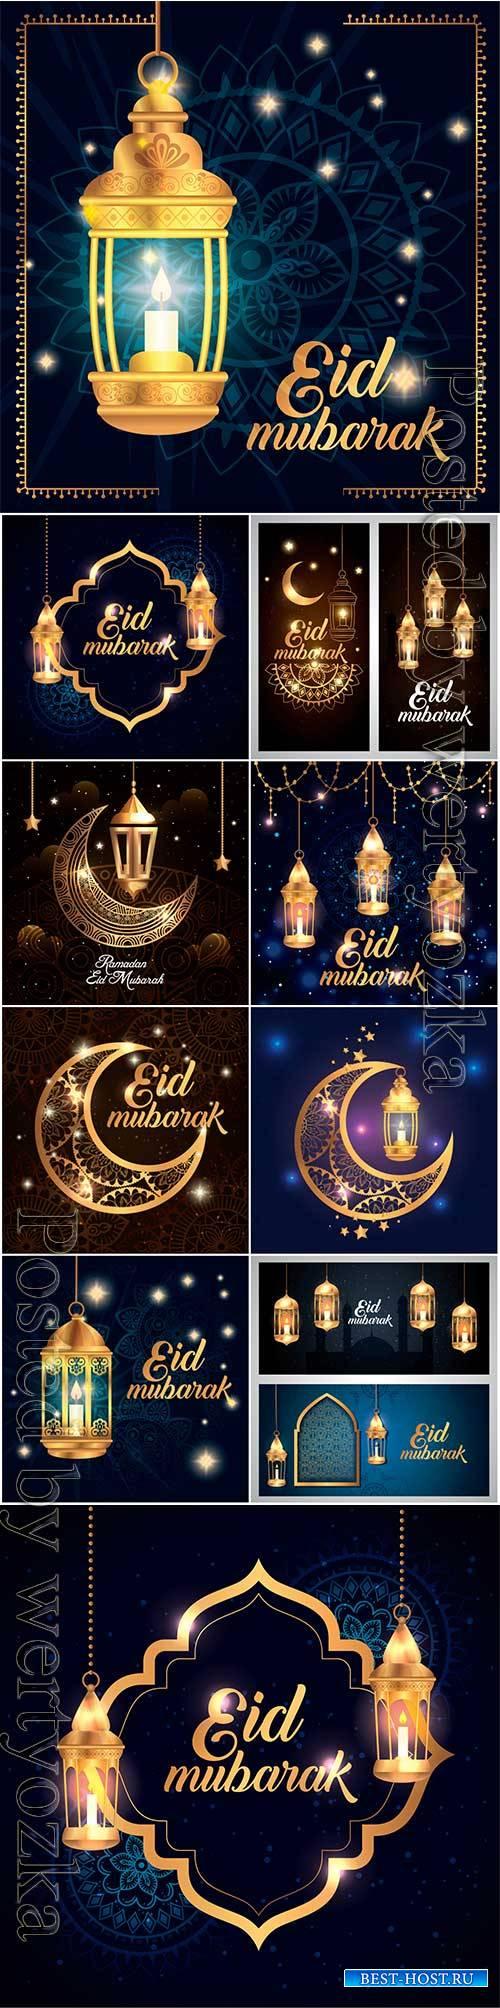 Eid mubarak poster with lantern hanging and decoration vector illustration